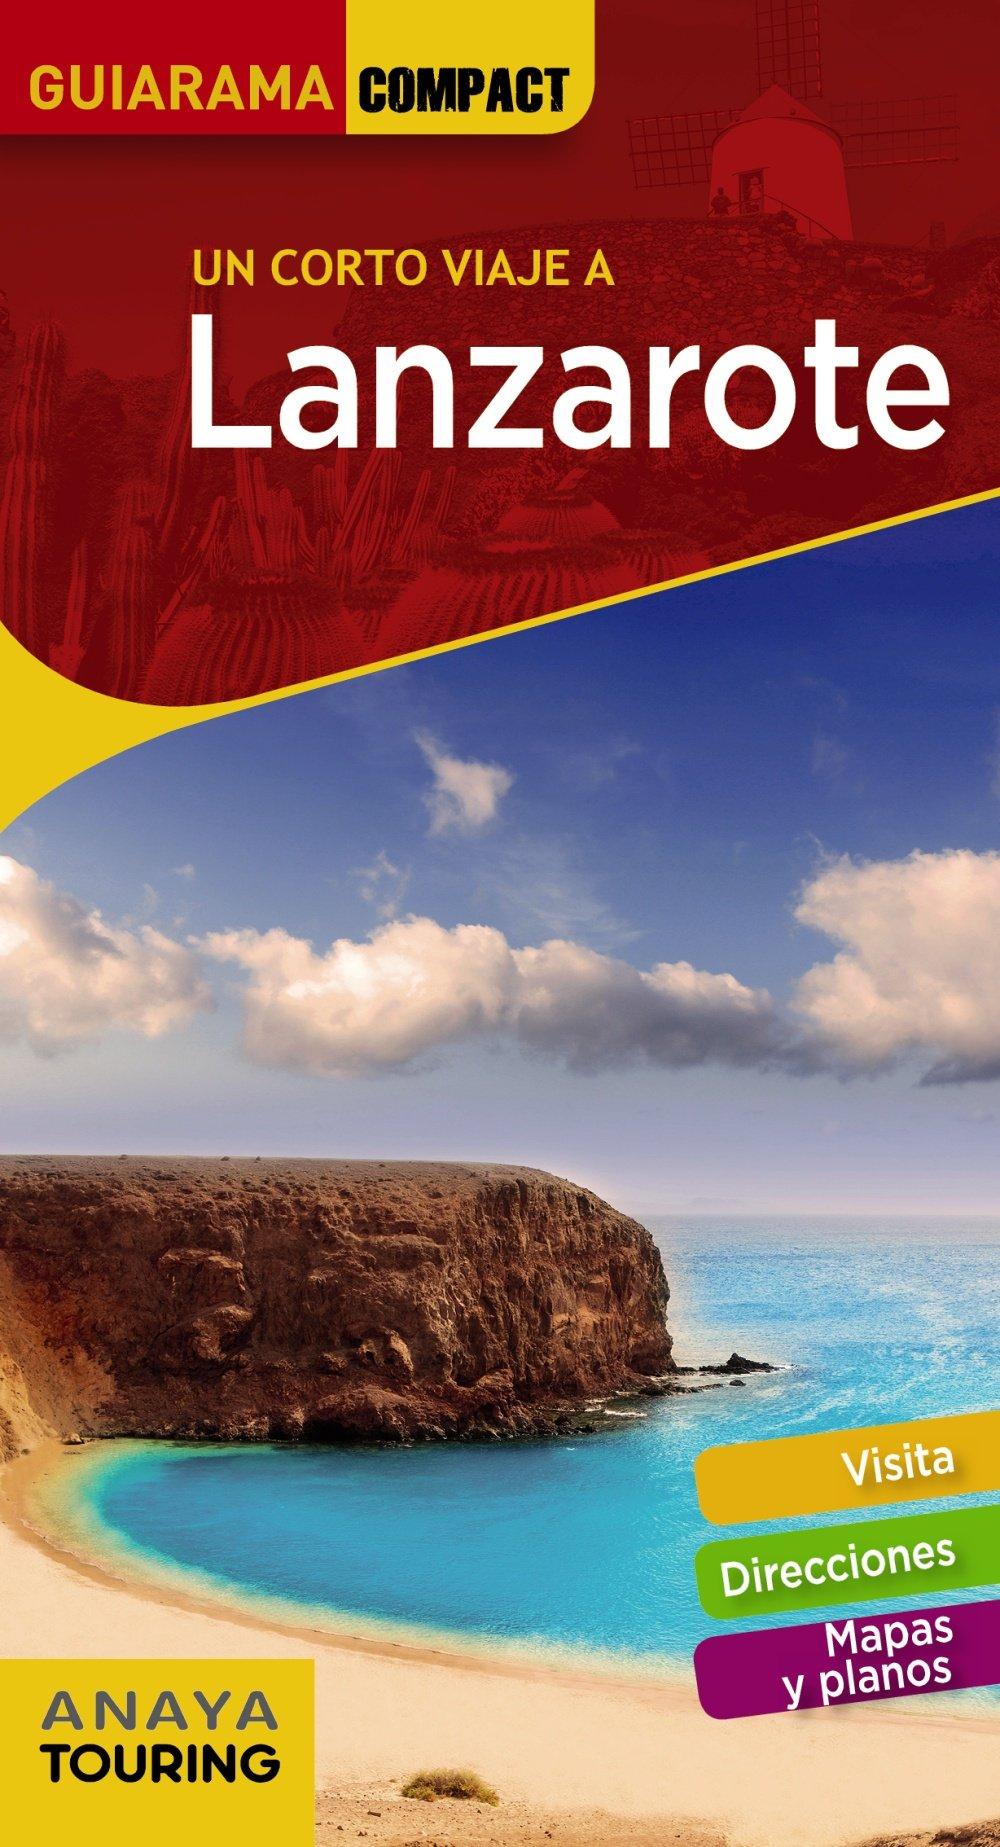 Lanzarote (Guiarama Compact - España) Tapa blanda – 21 jun 2018 Anaya Touring Xavier Martínez i Edo 8491581197 Travel & holiday guides